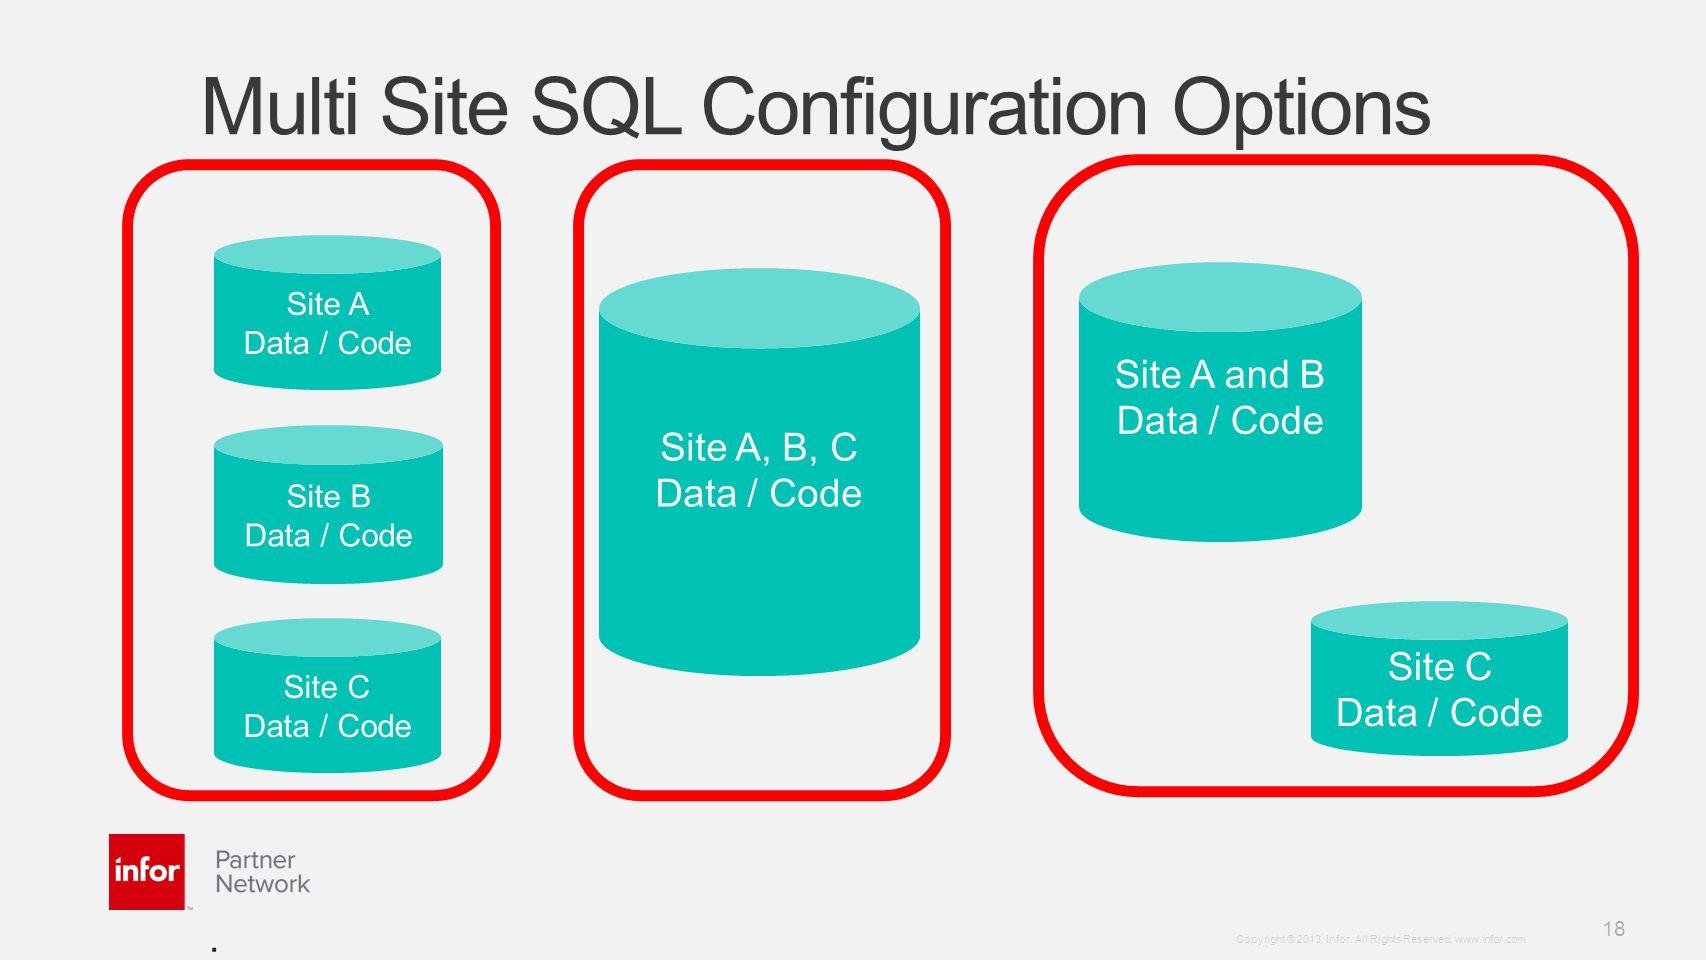 Multi Site SQL Configuration Options